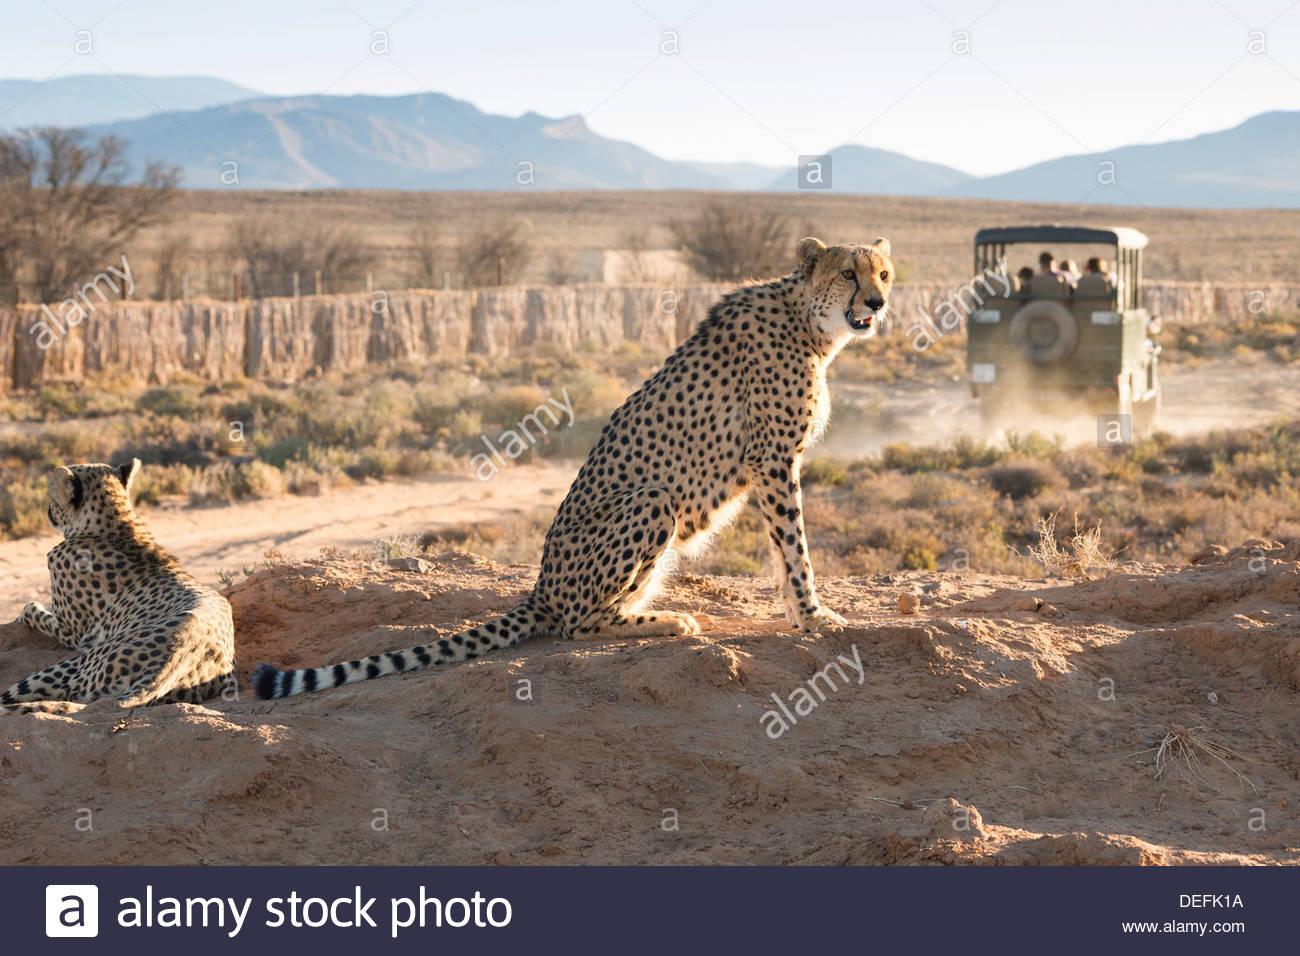 Safari jeep leaving cheetahs (Acinonyx jubatus) on game drive, Inverdoorn Game Reserve, Karoo desert, Ceres, South Africa - Stock Image